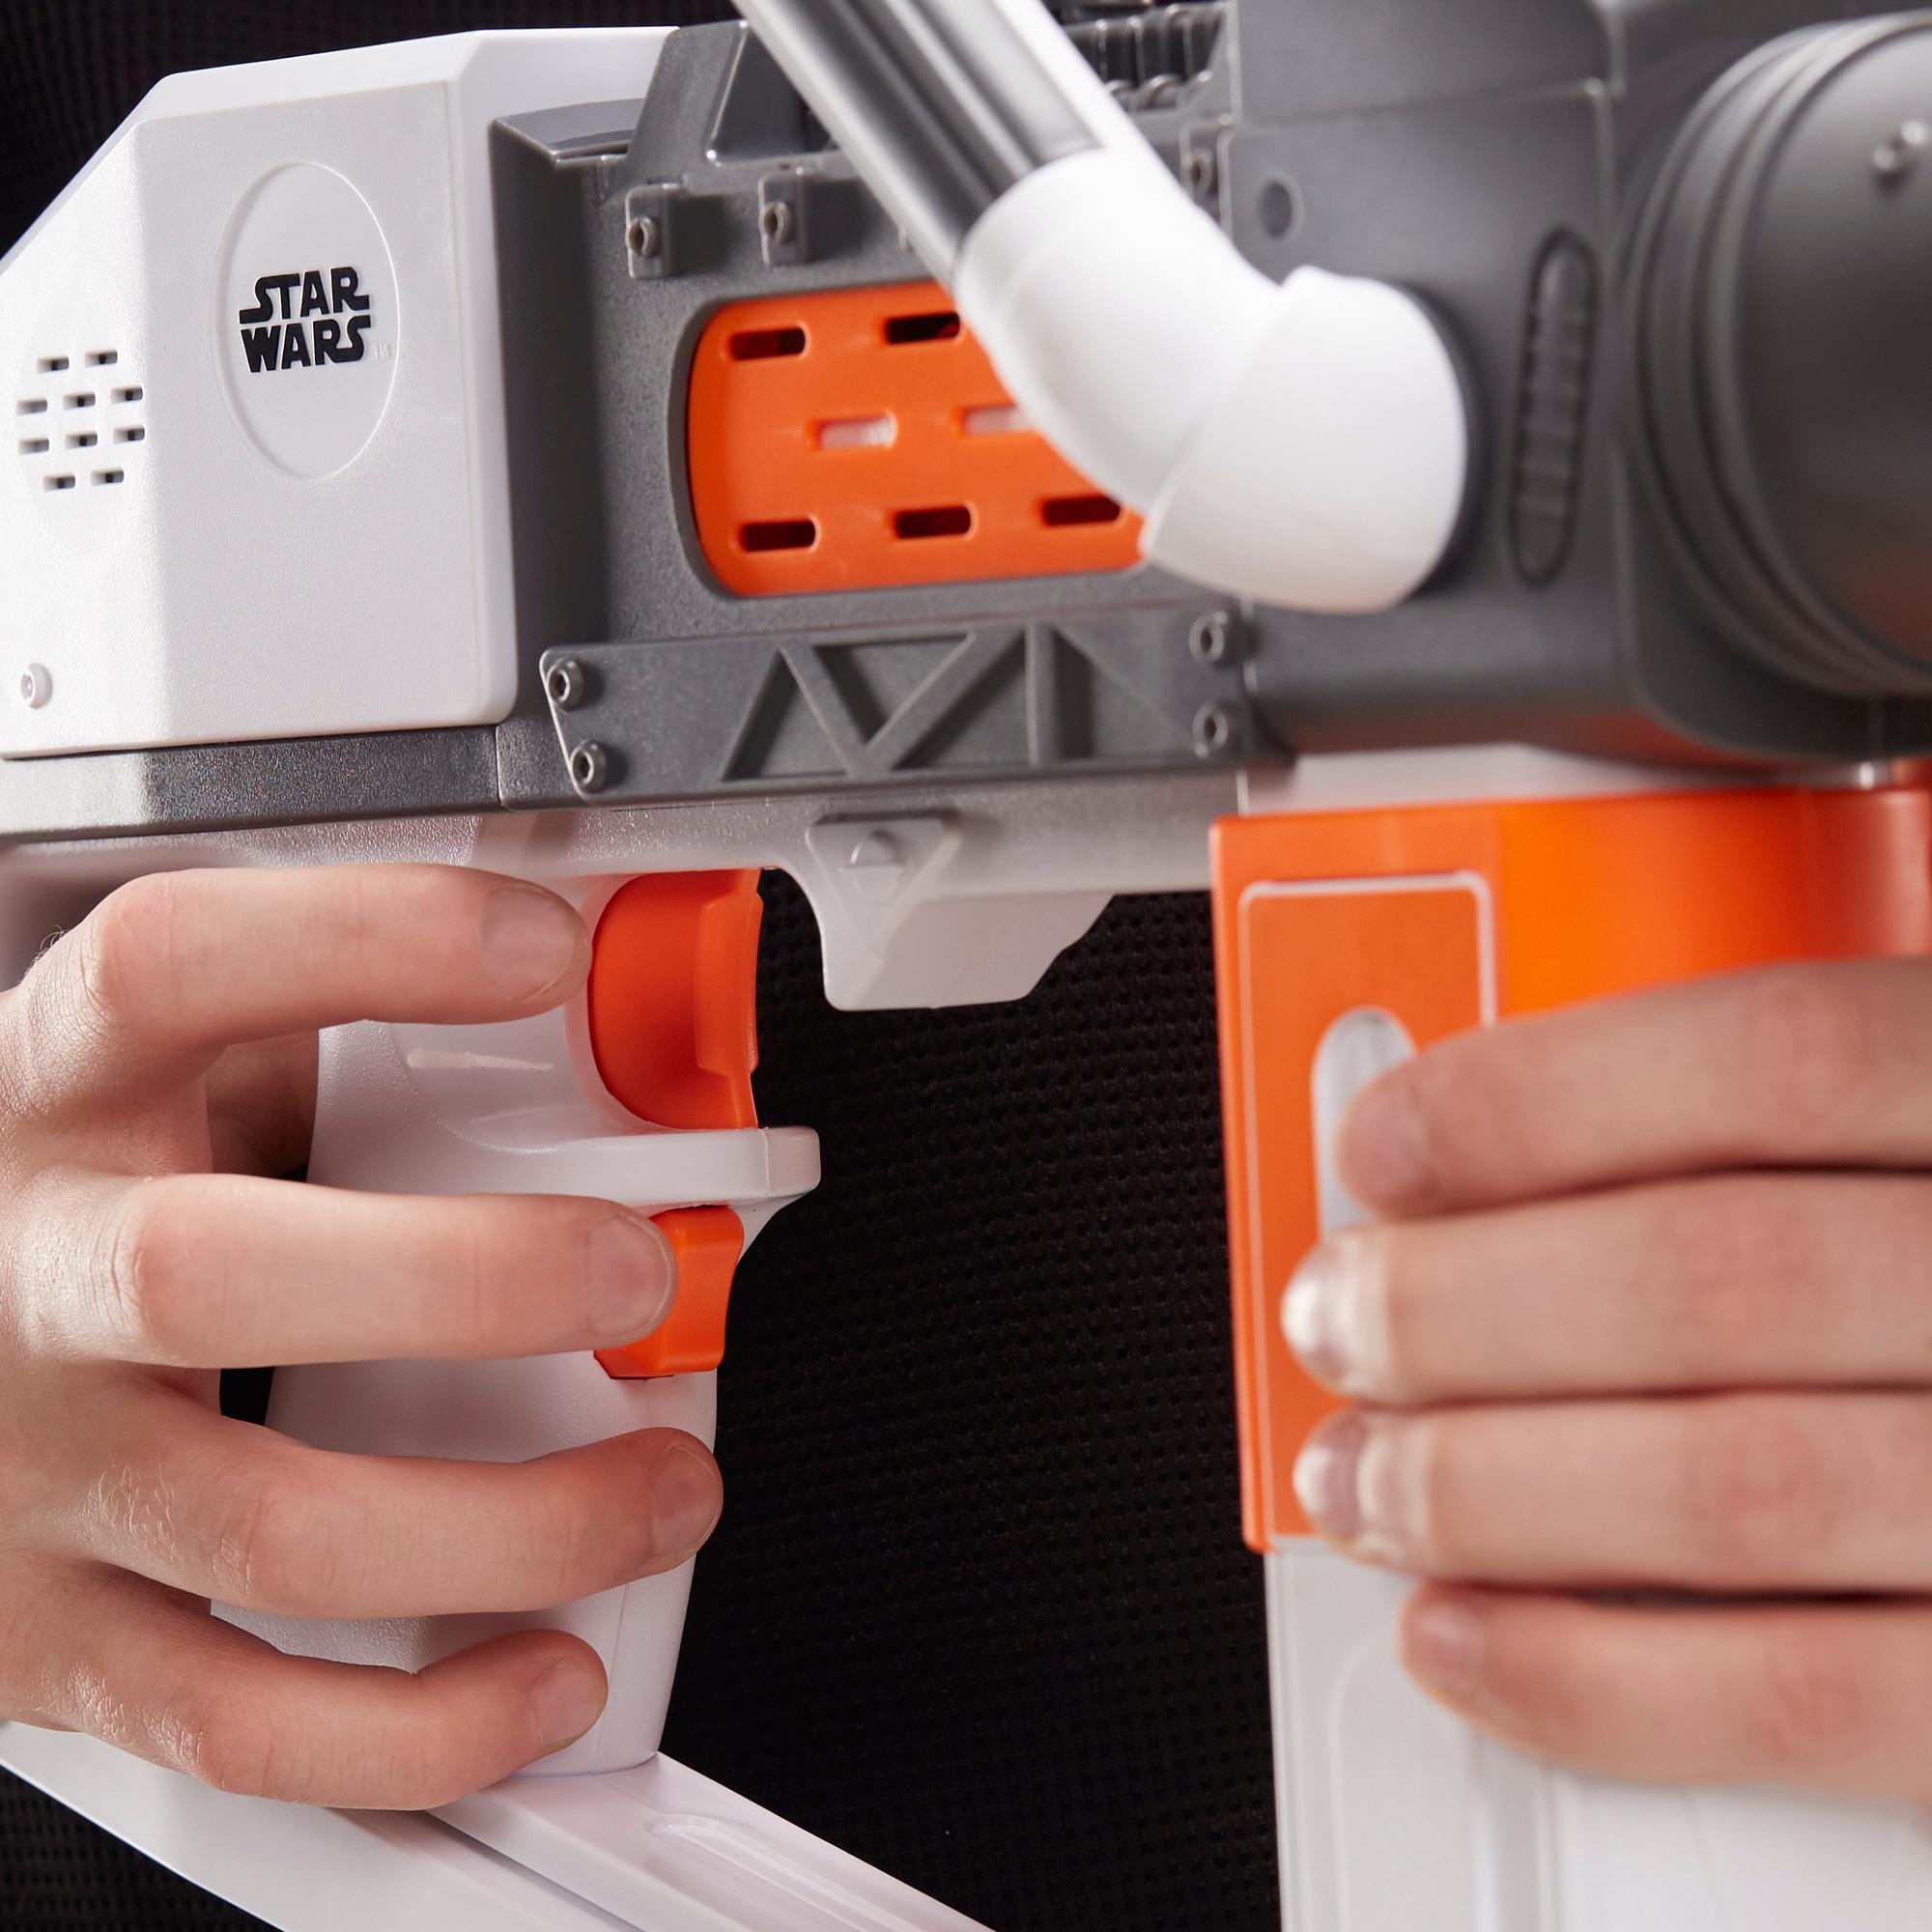 Star Wars Nerf - Blaster de luxe de Stormtrooper du Premier Ordre